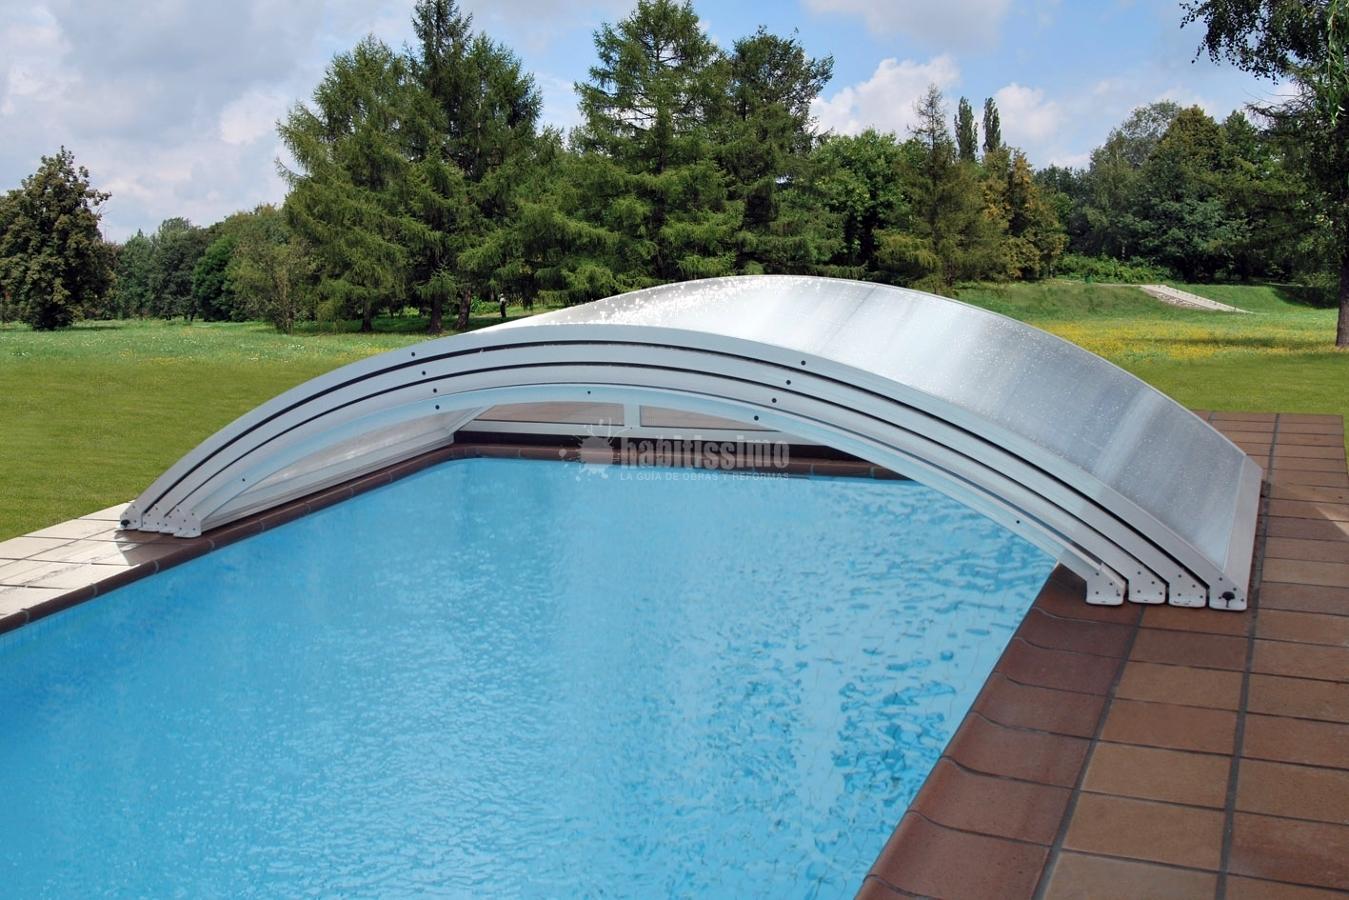 Foto carpinter a aluminio cubiertas piscinas techos for Piscinas de aluminio